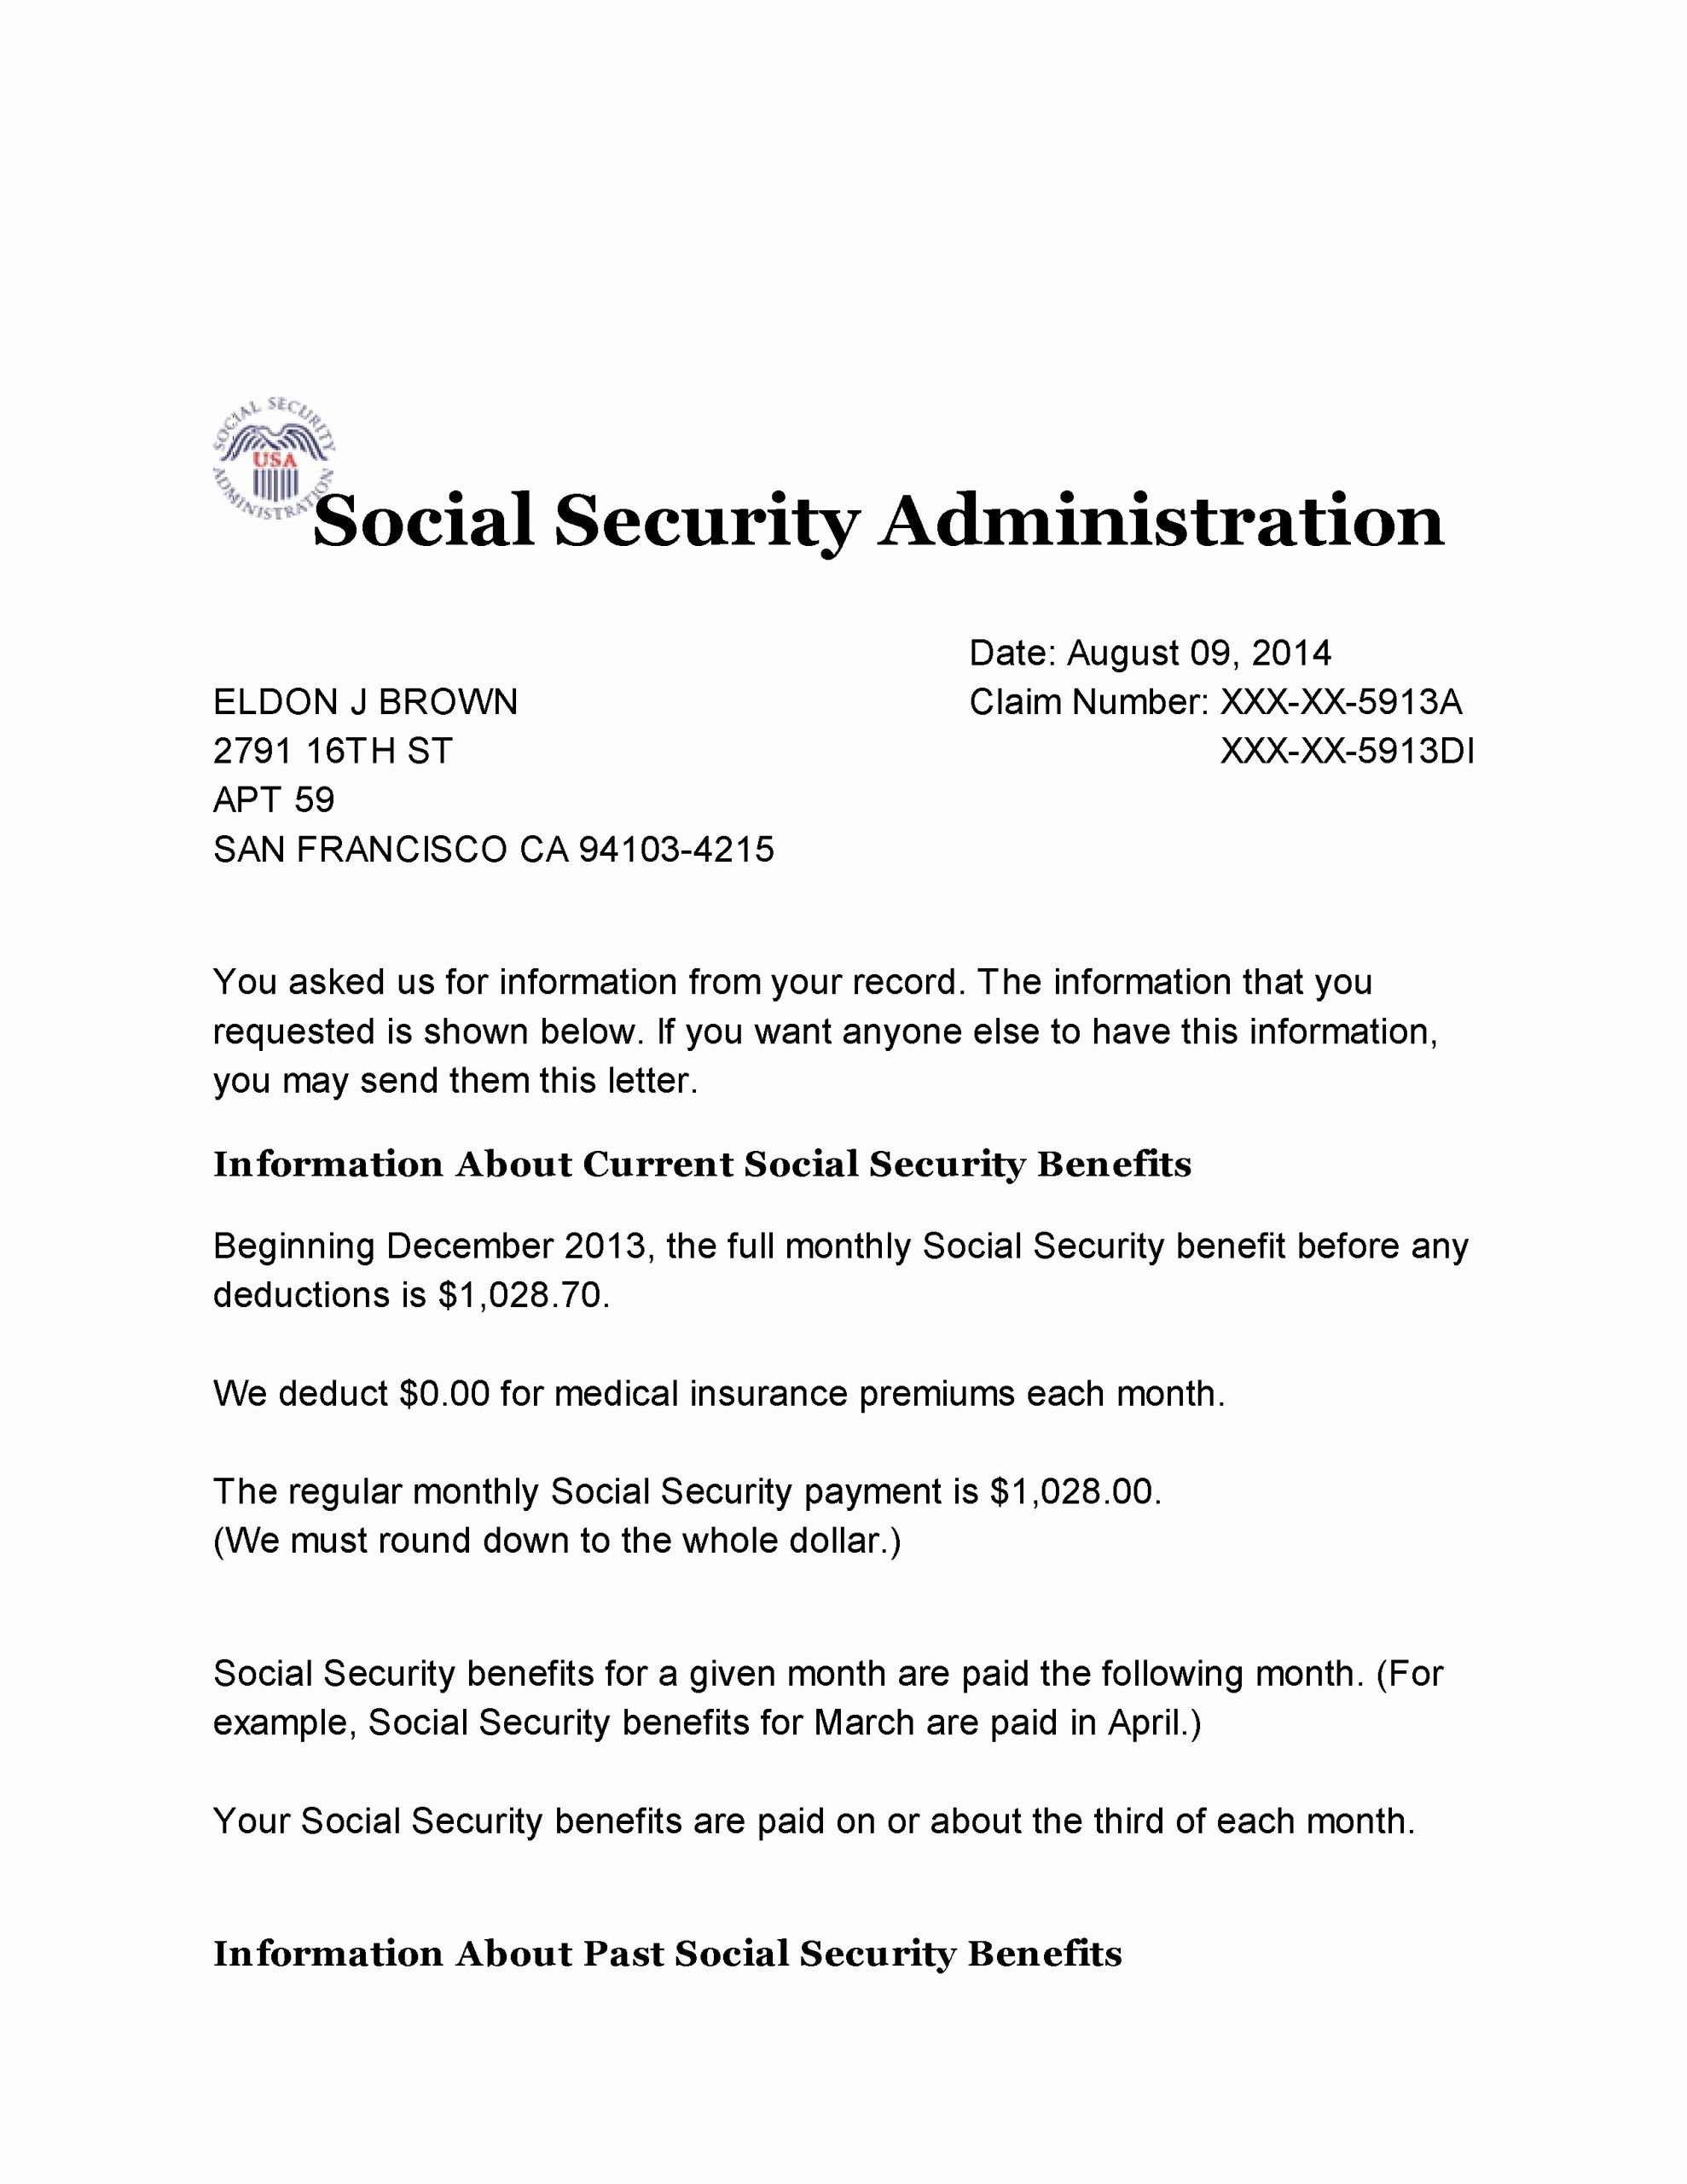 Benefits Verification Letter Inspirational social Security Benefit Letter